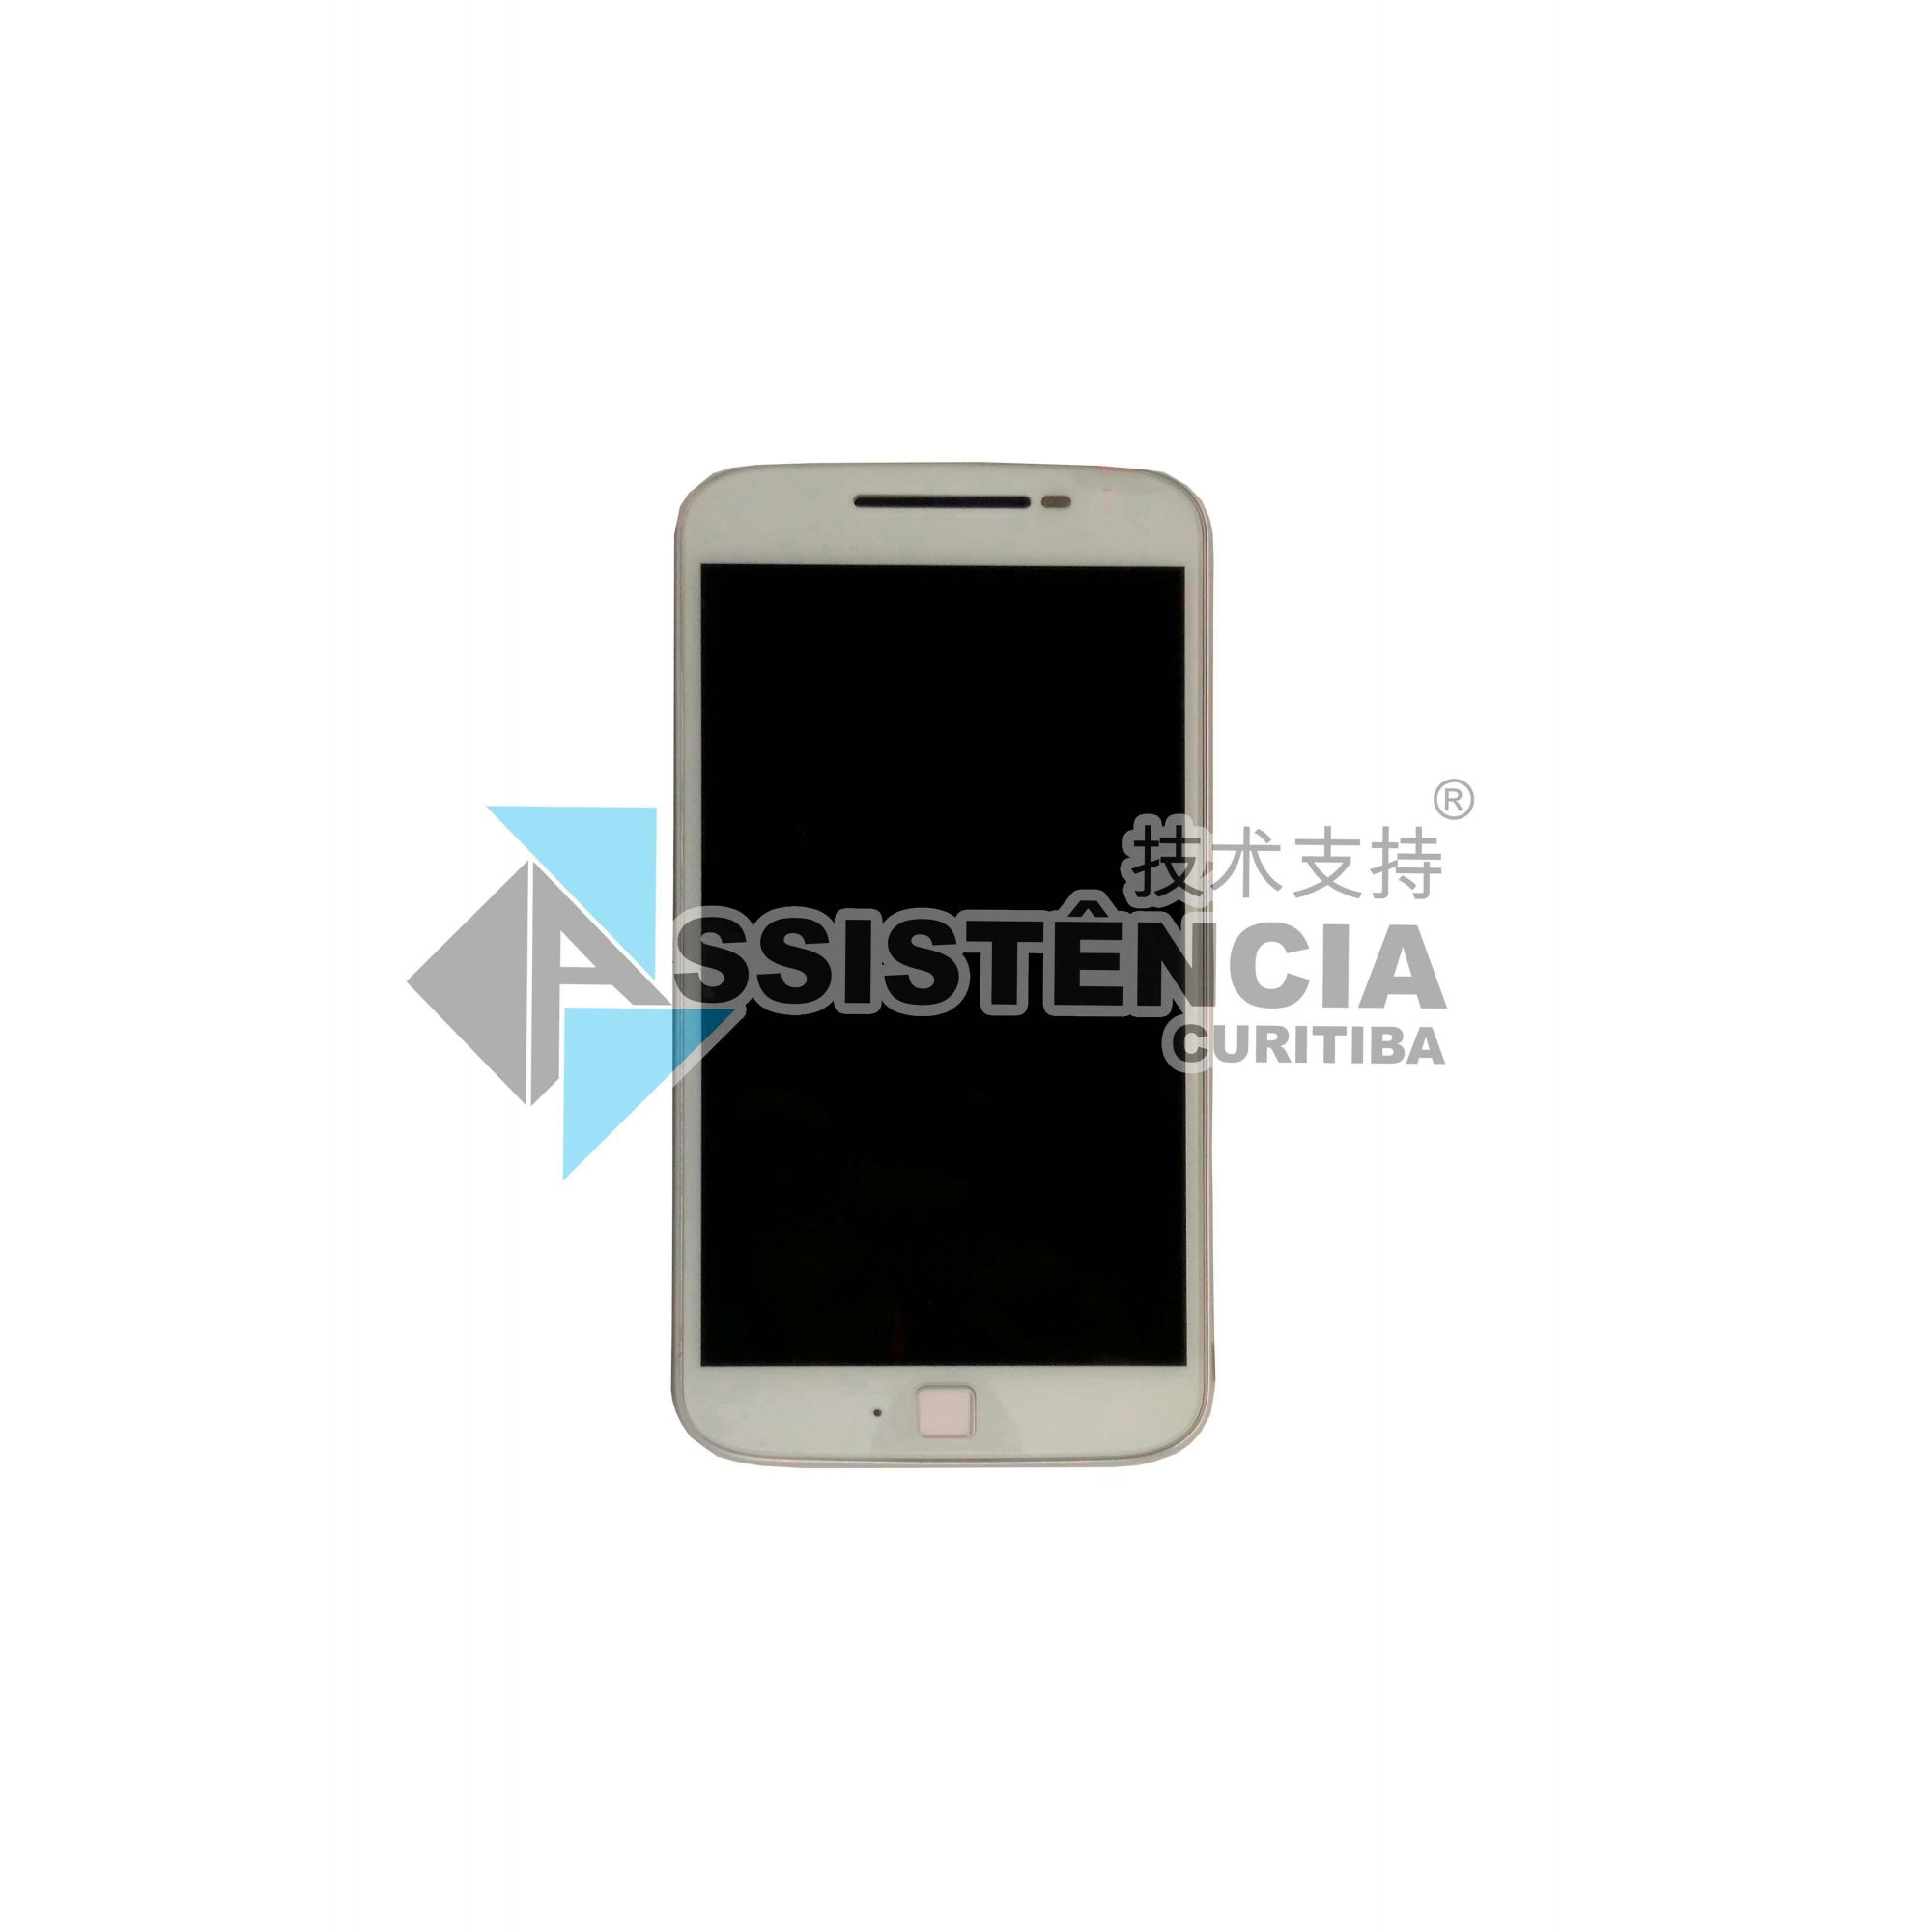 Tela Display Motorola Moto G4 Plus Xt1640 Xt1644 5.5 Com Aro Original Retirada Branco